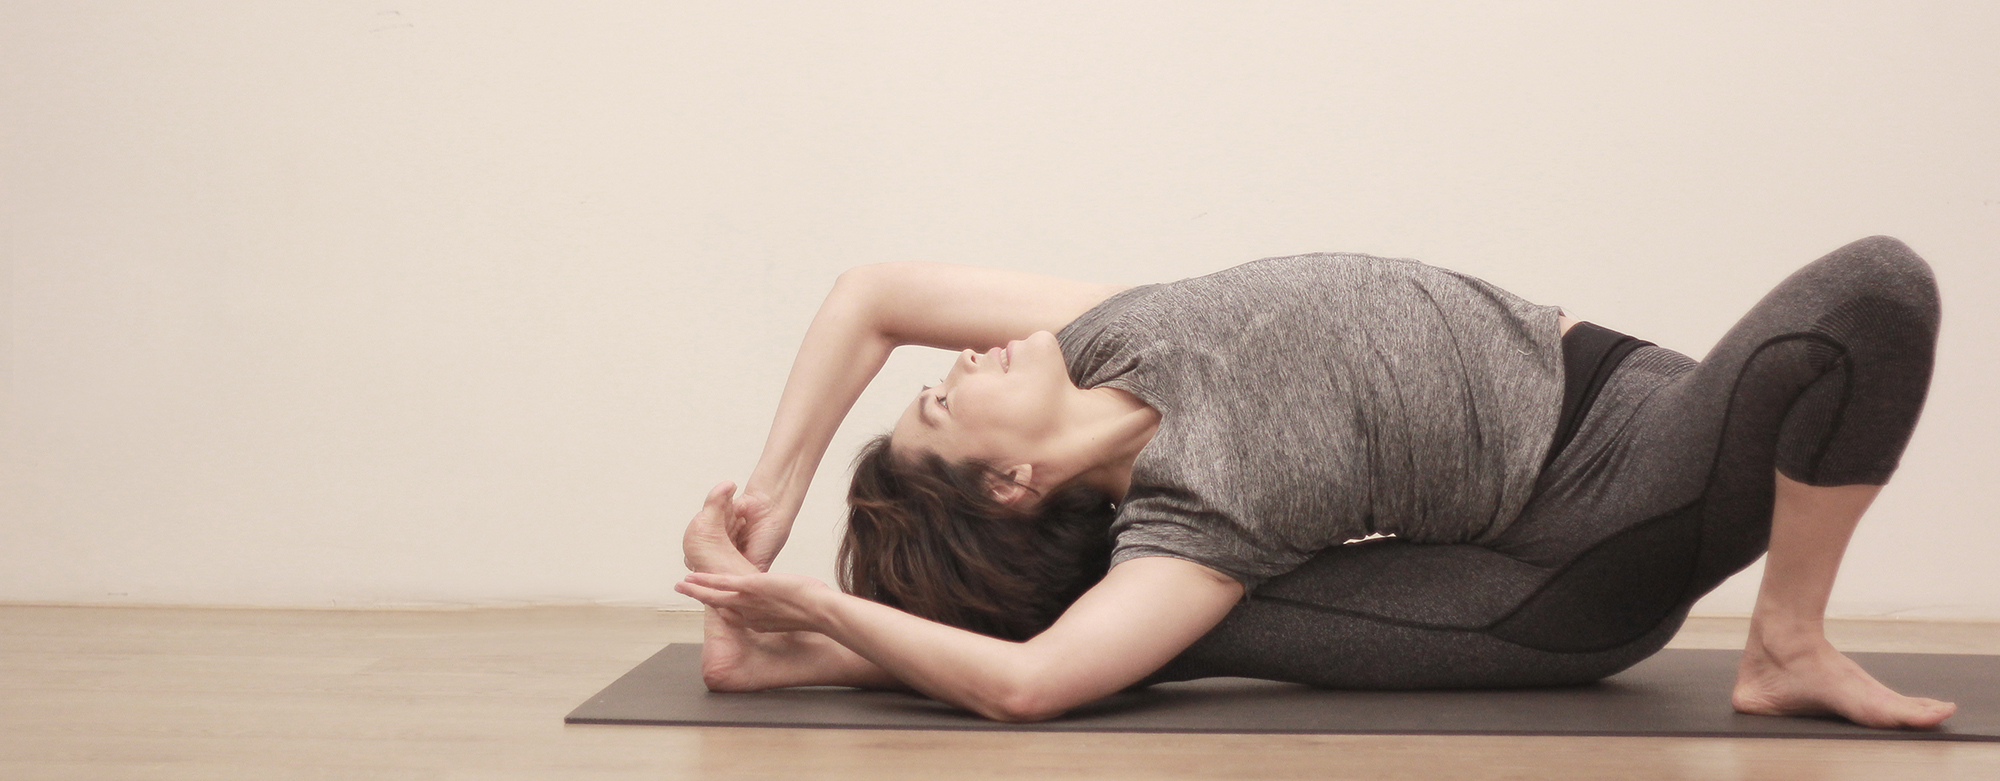 0718 yoga